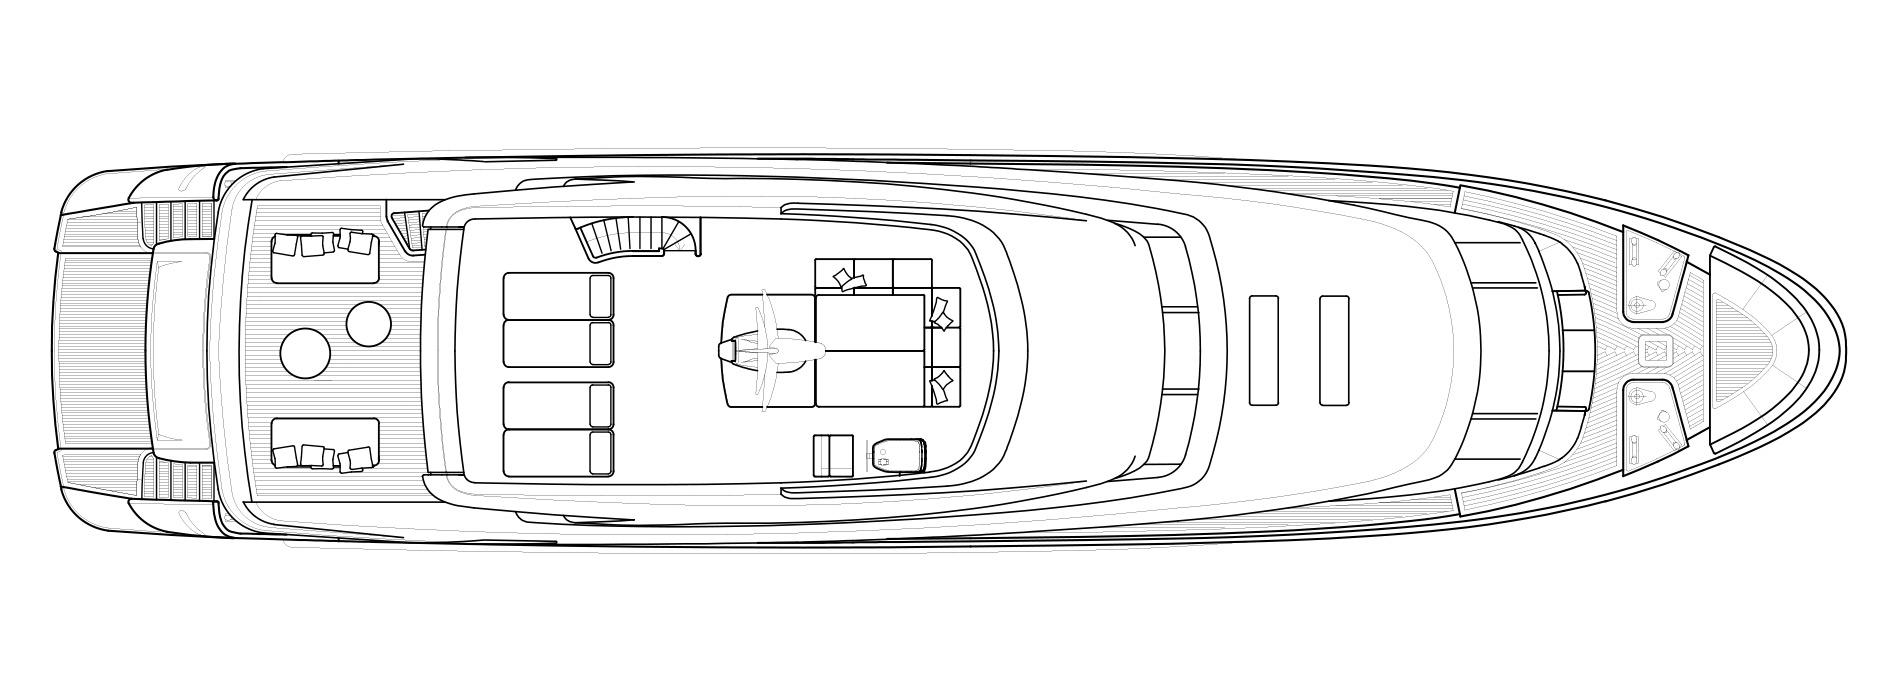 Sanlorenzo Yachts SD112 Флайбридж версия A